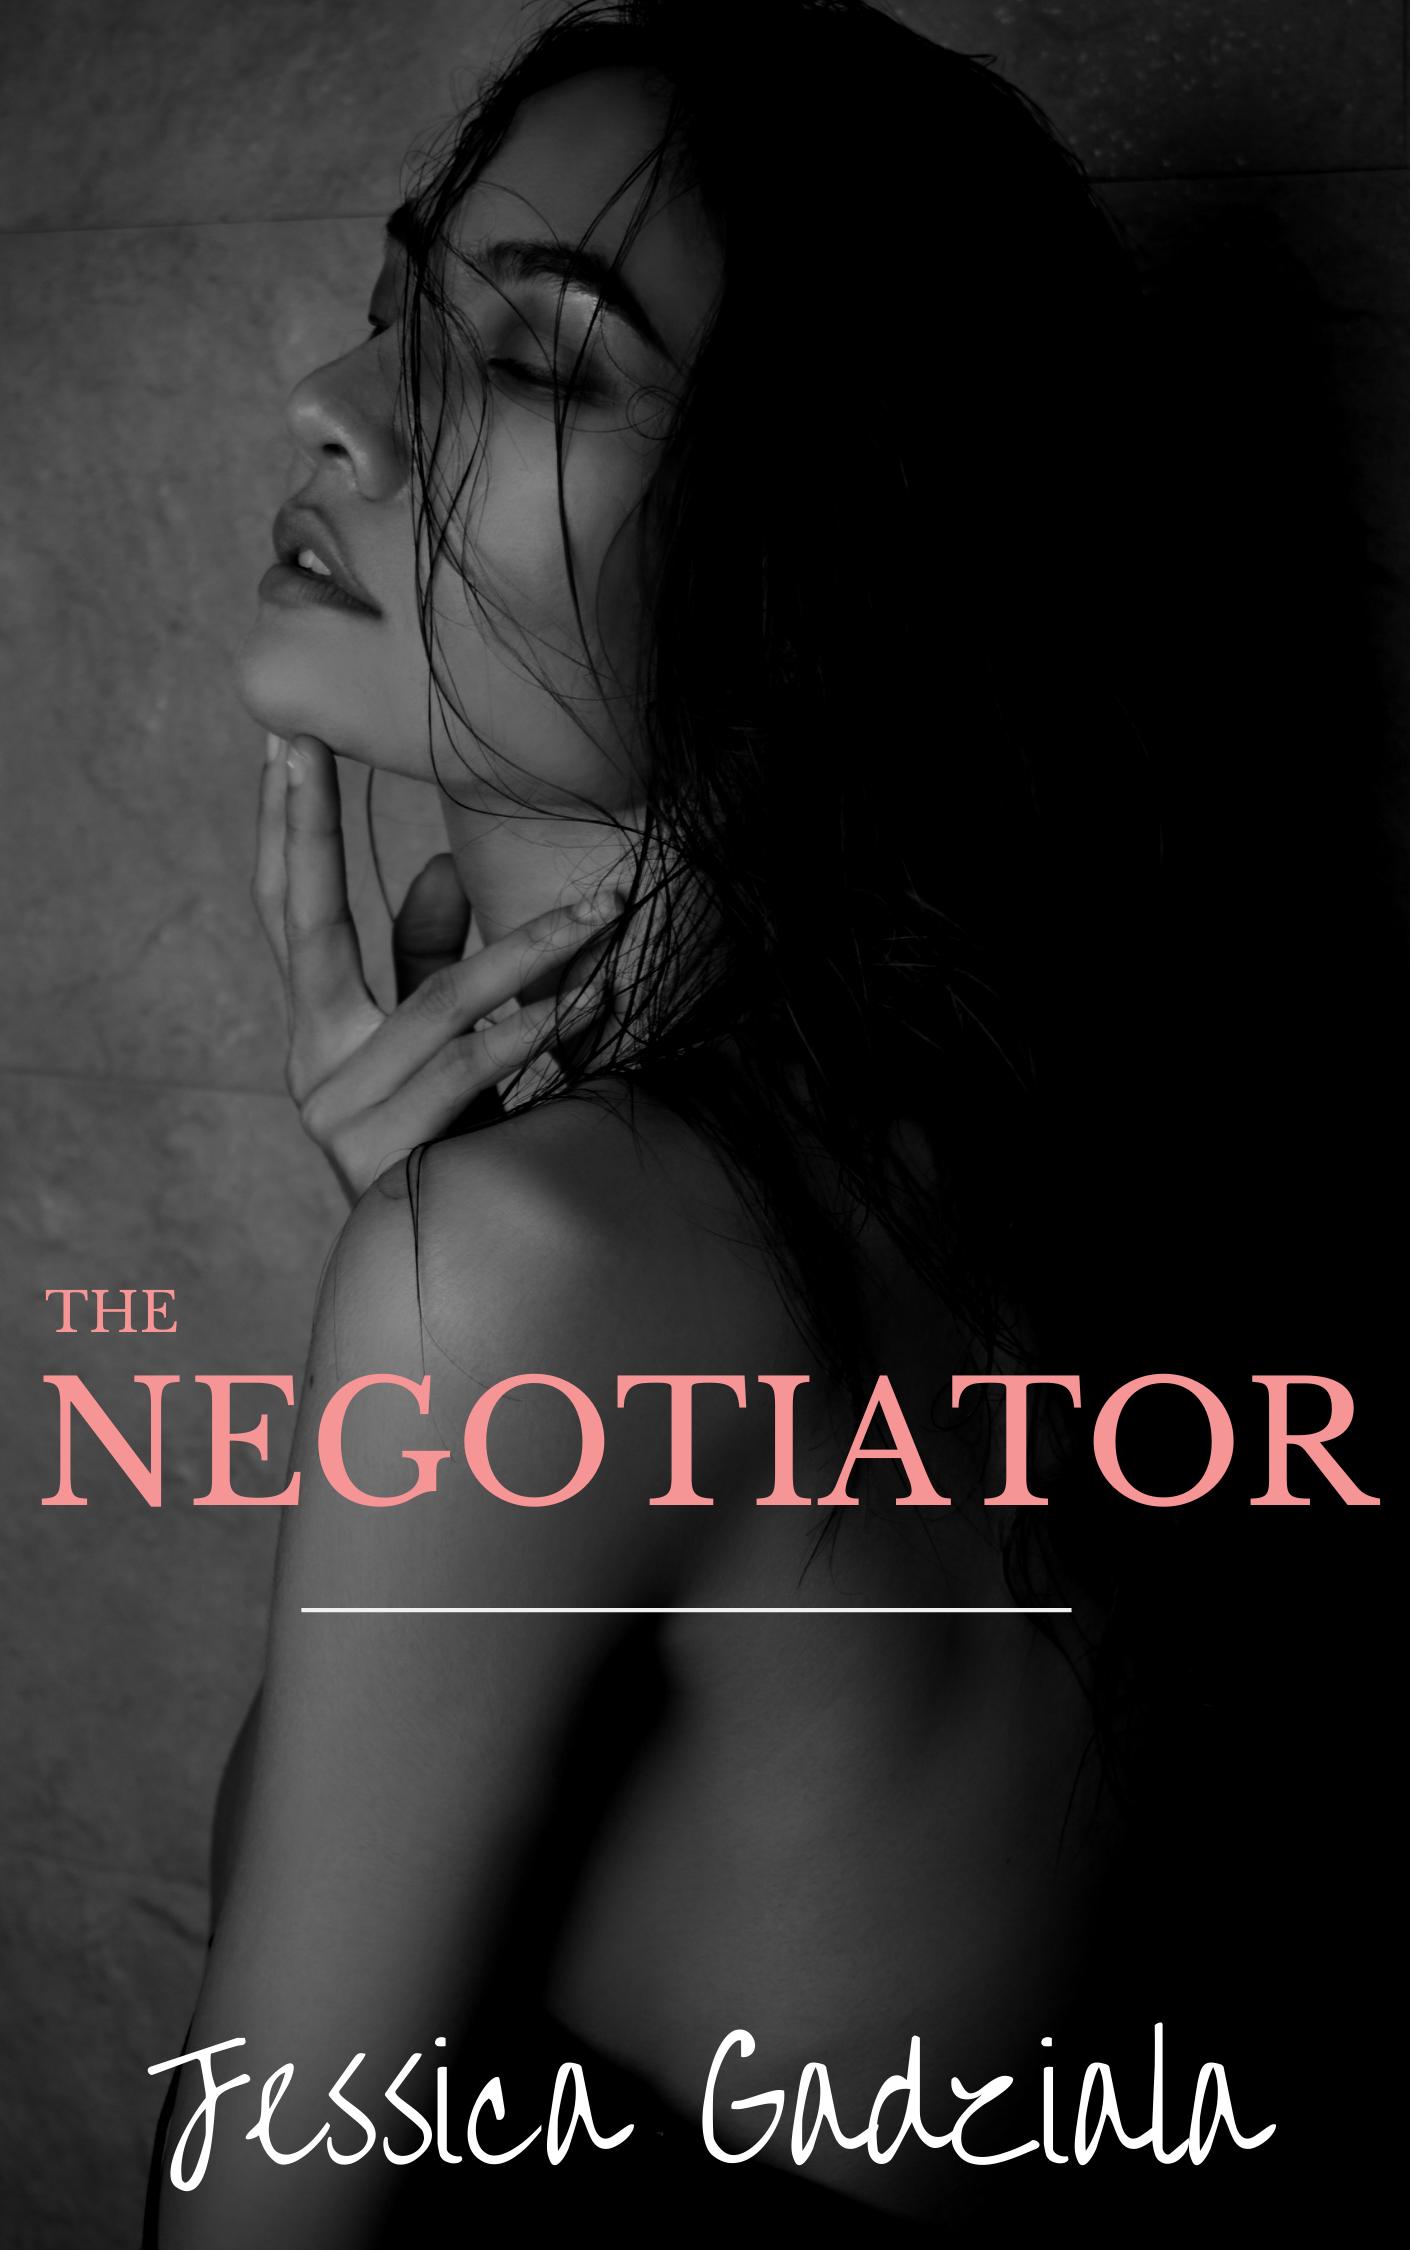 Jessica Gadziala - Professionals 7 - The Negotiator